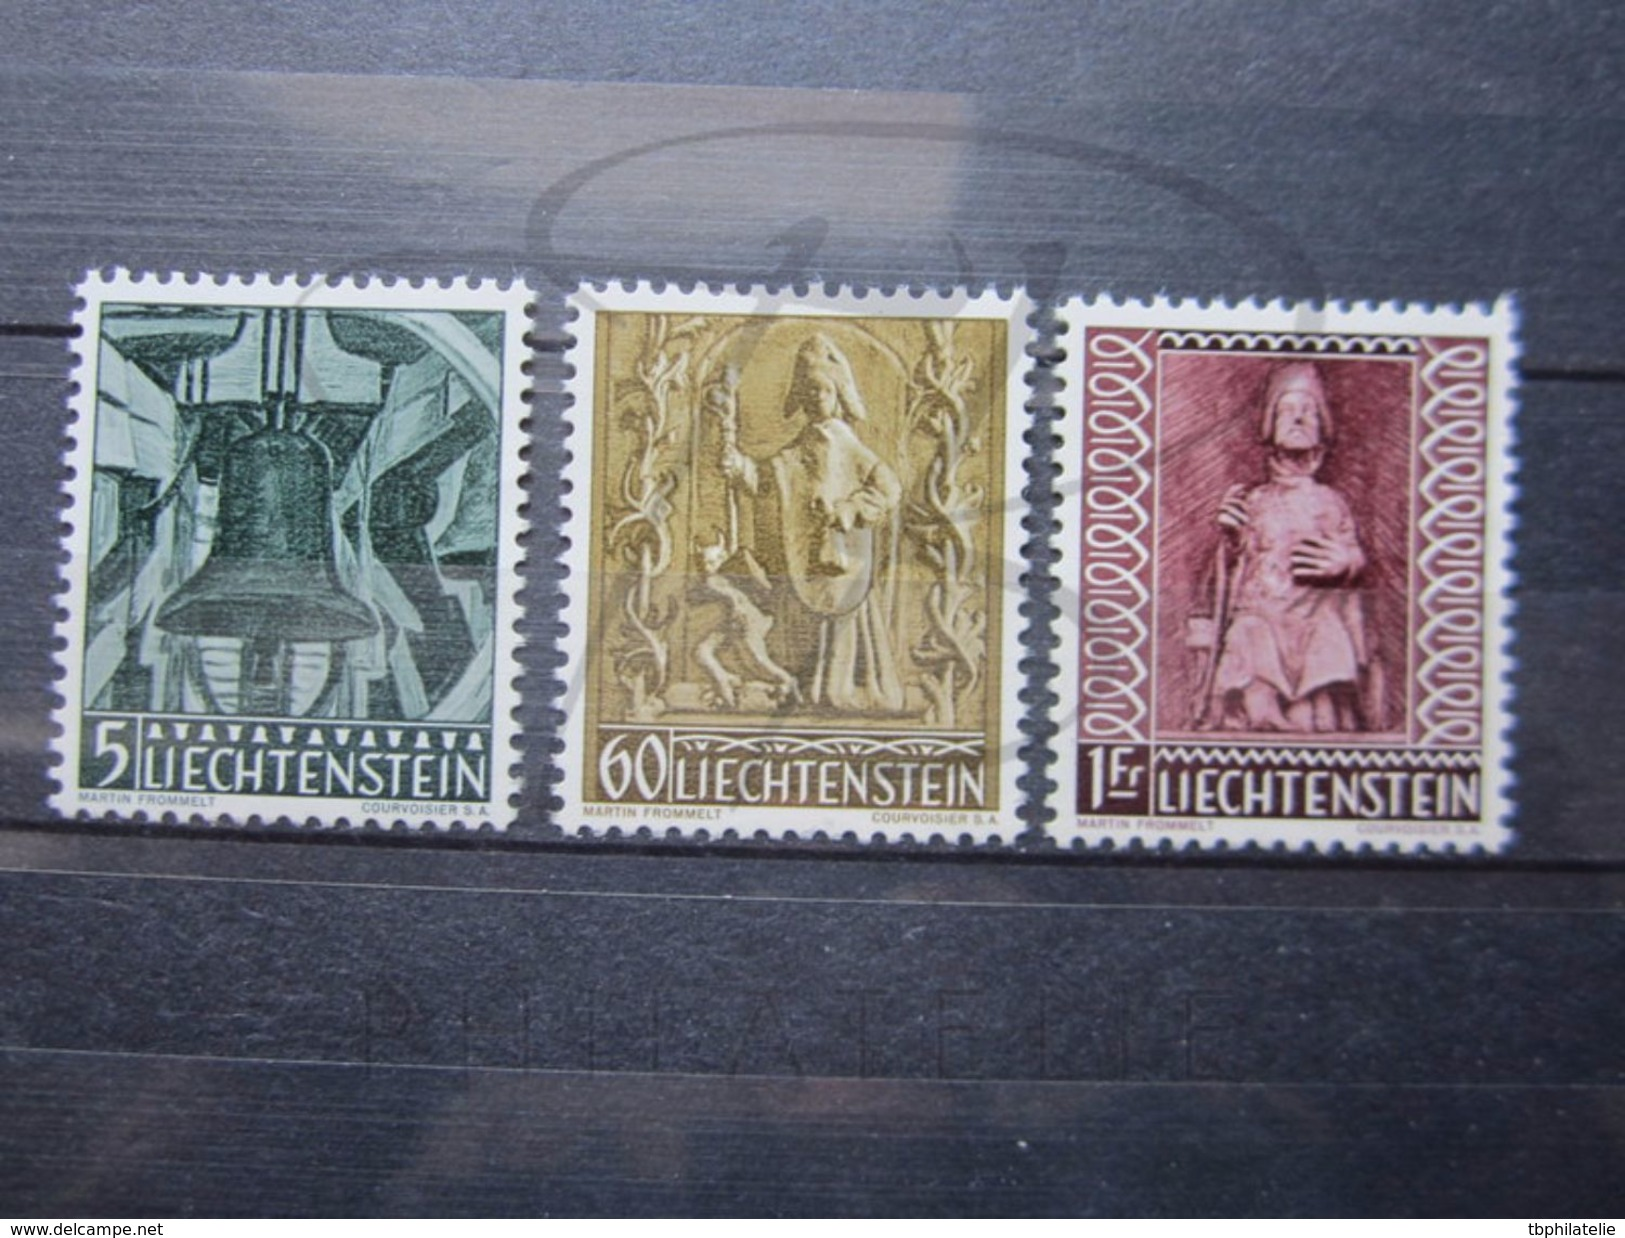 VEND TIMBRES DU LIECHTENSTEIN N° 350 - 352 , NEUFS SANS CHARNIERE !!! - Liechtenstein